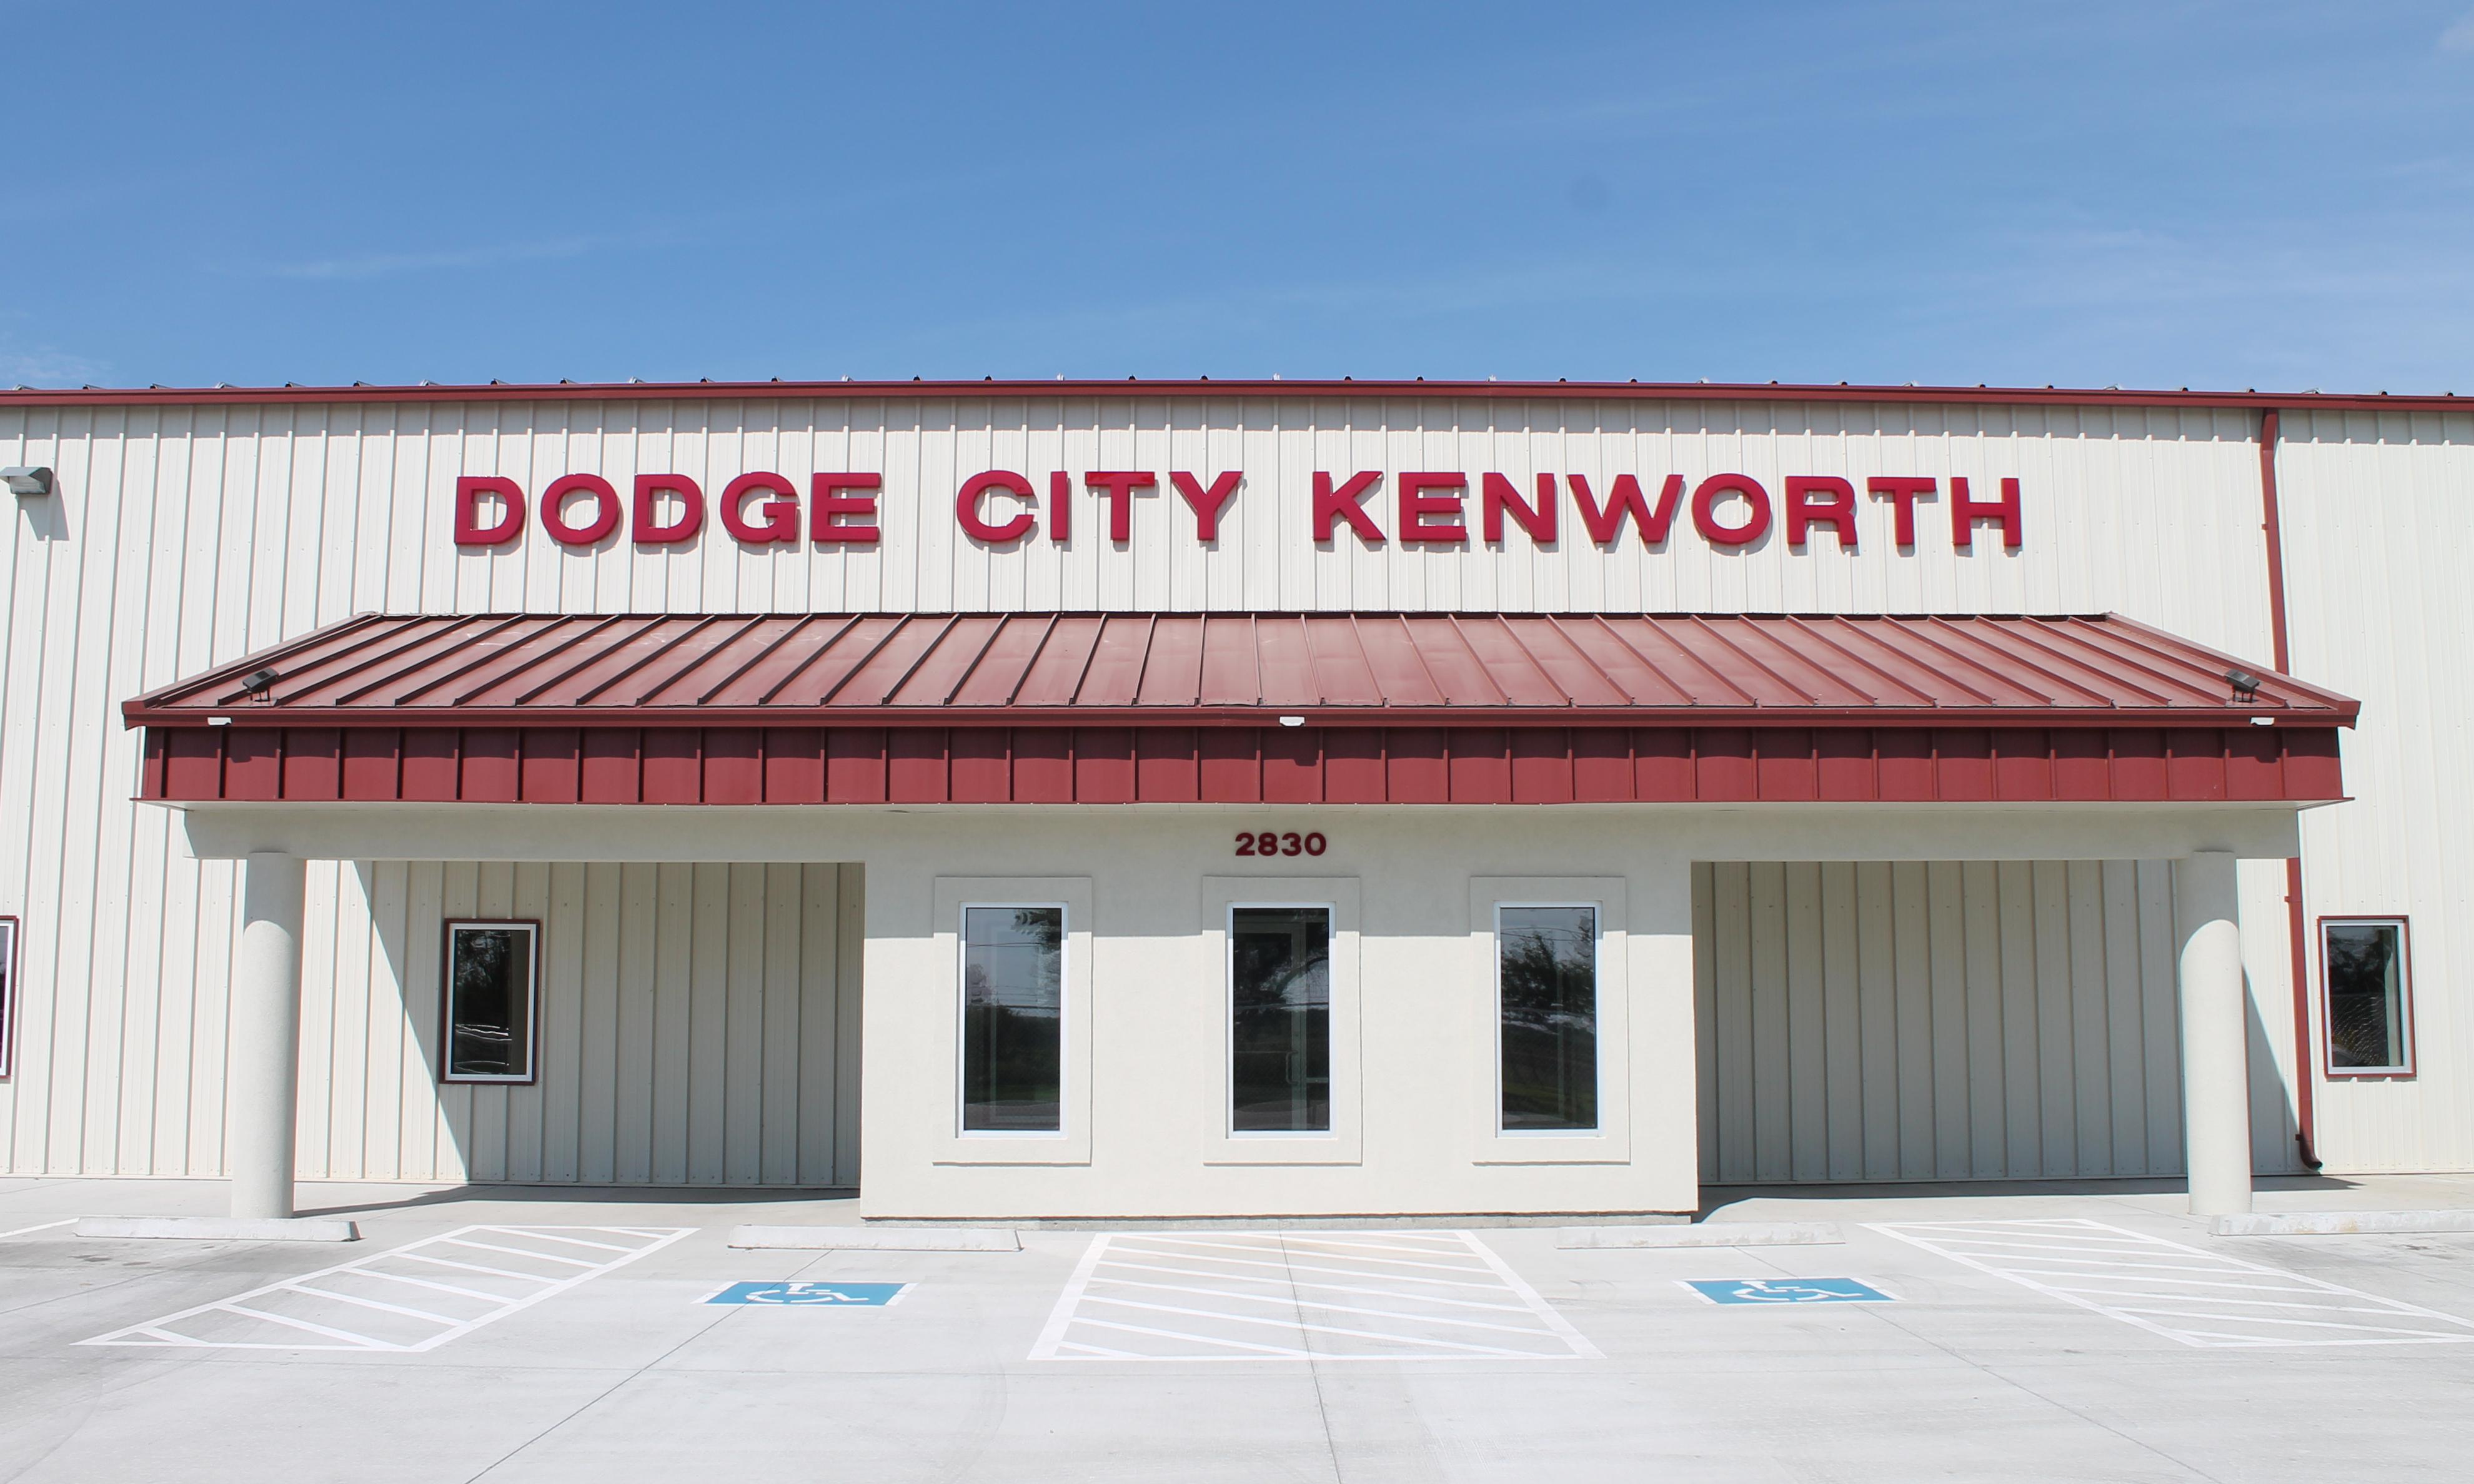 Dodge City Kenworth image 0